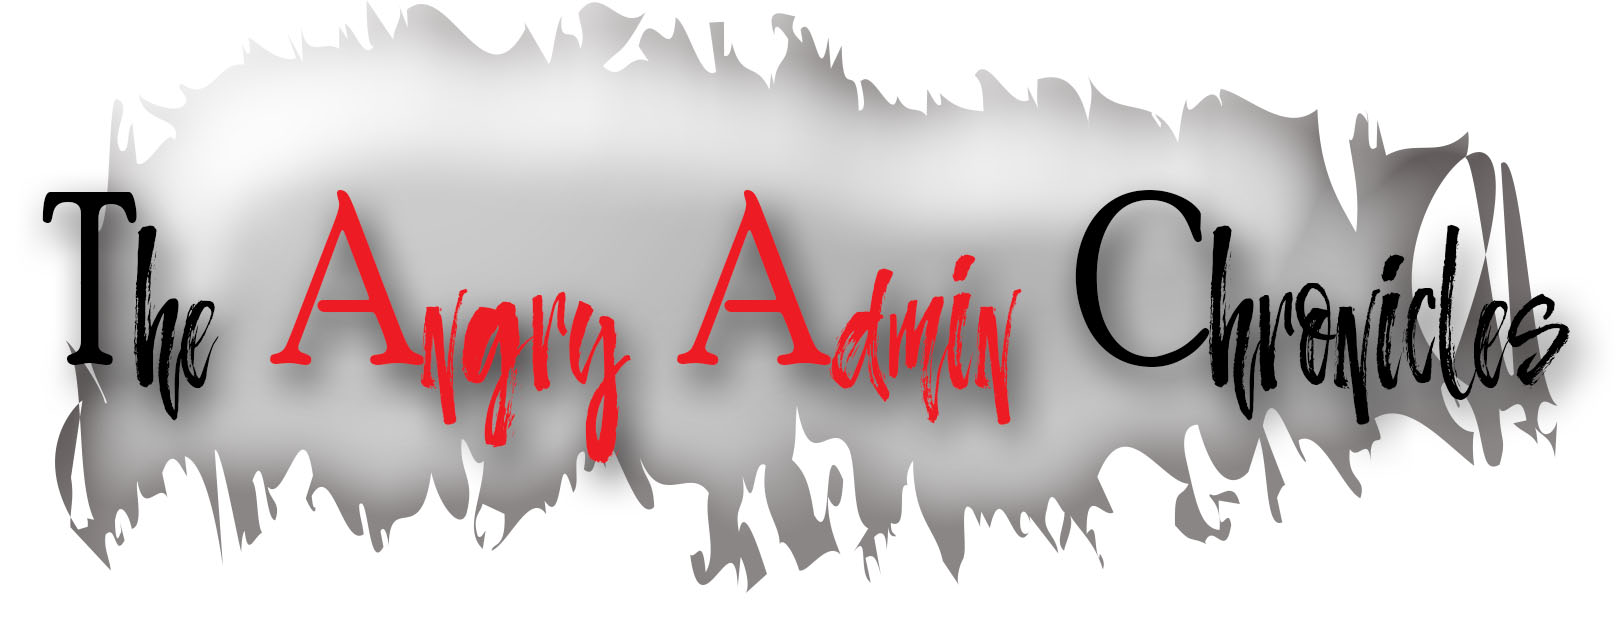 AngryAdmin Title2